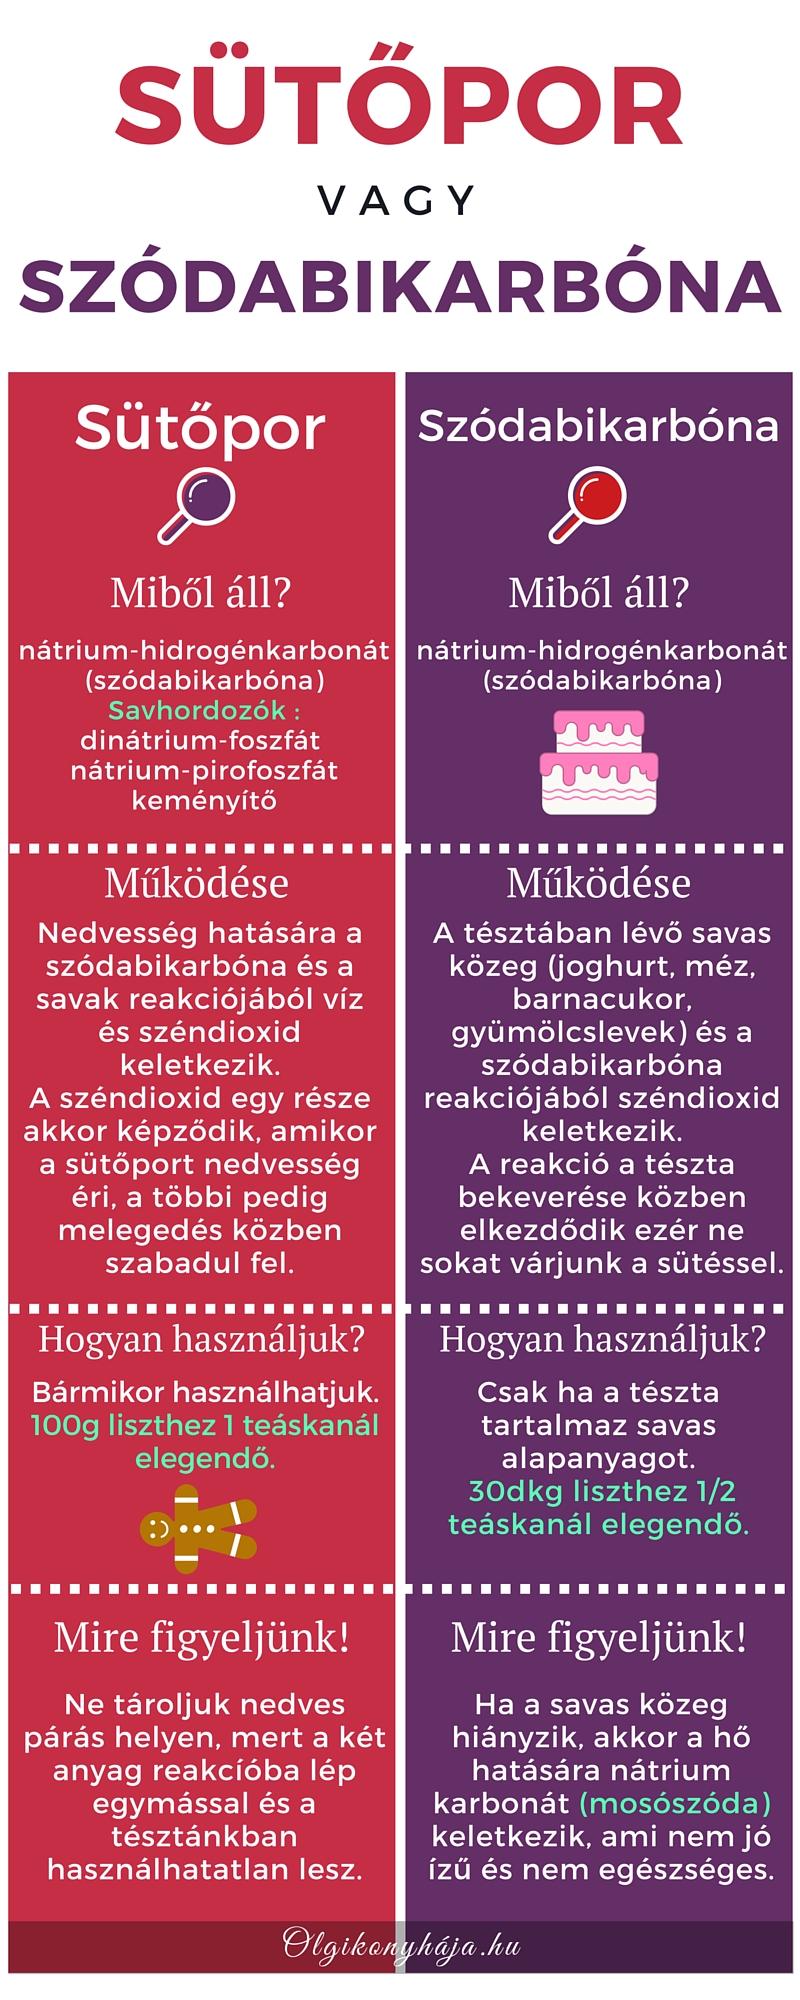 Sutopor-helyett-szodabikarbona-infografika